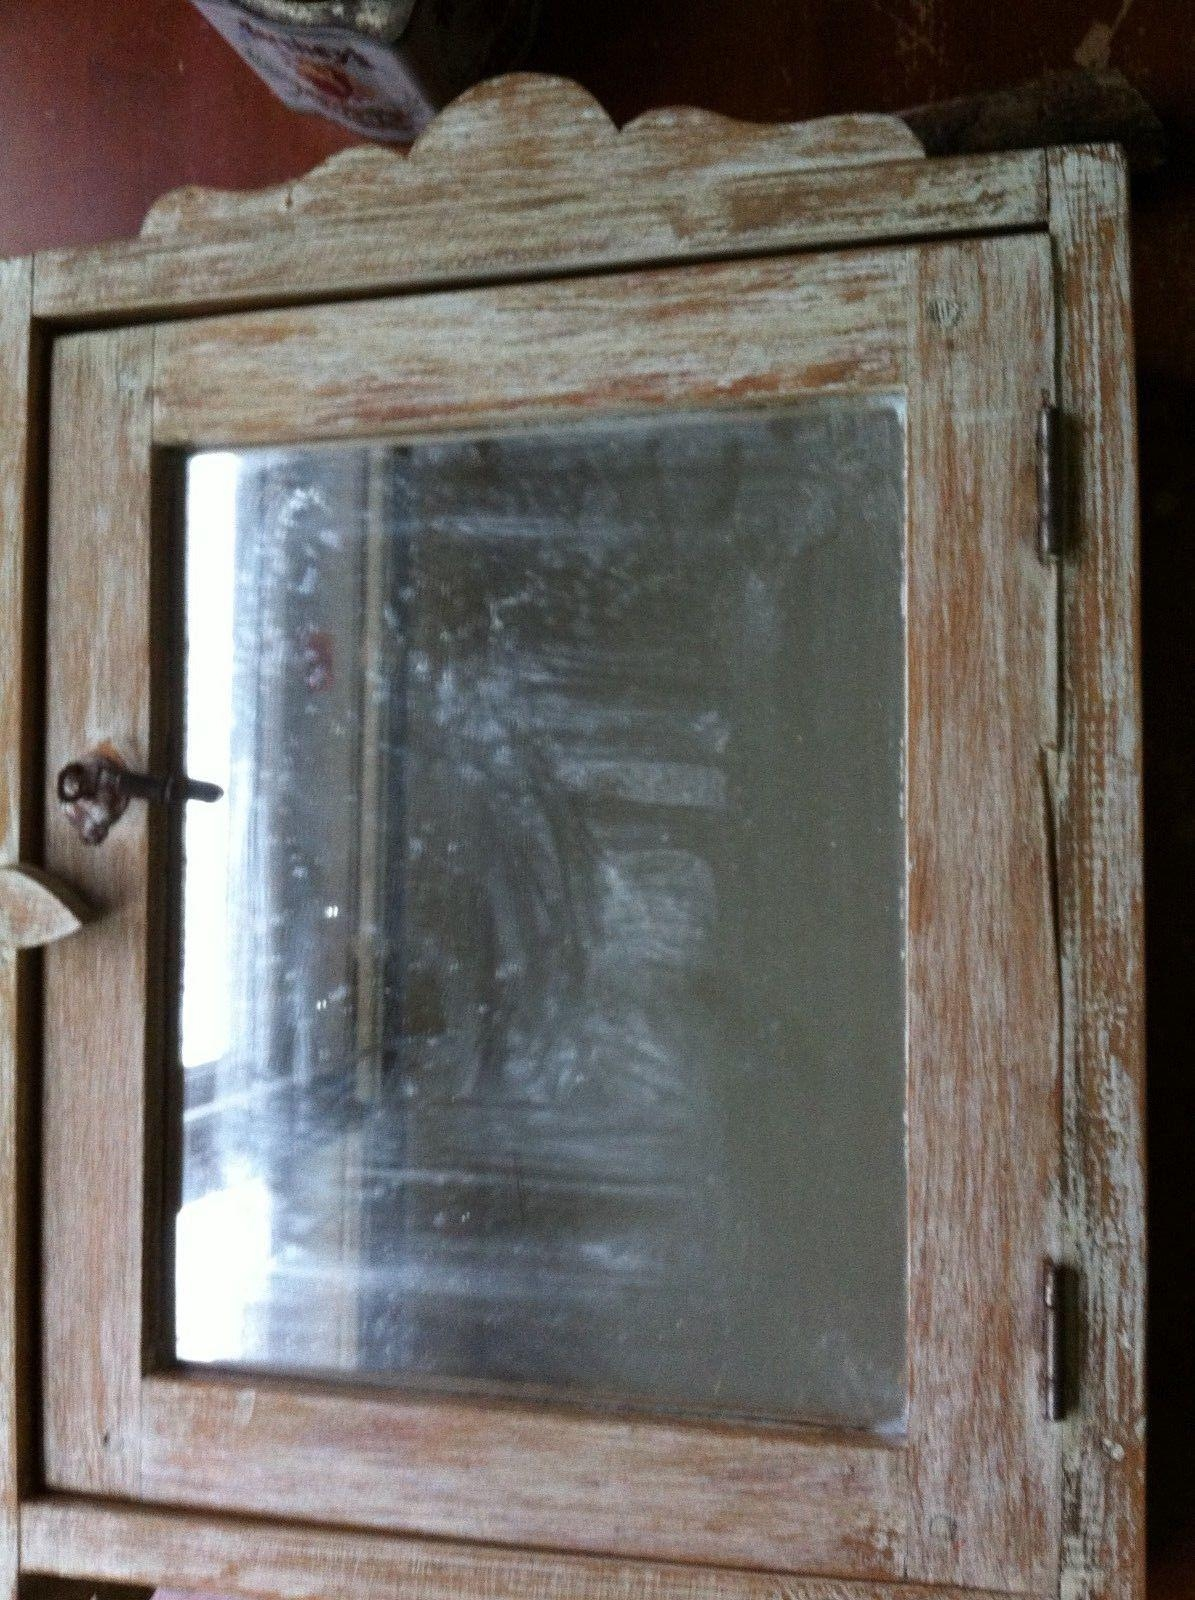 Vintage Wood Bathroom Medicine Cabinet Glass Mirror With Towel Bar Regarding Vintage Wood Mirrors (View 9 of 20)